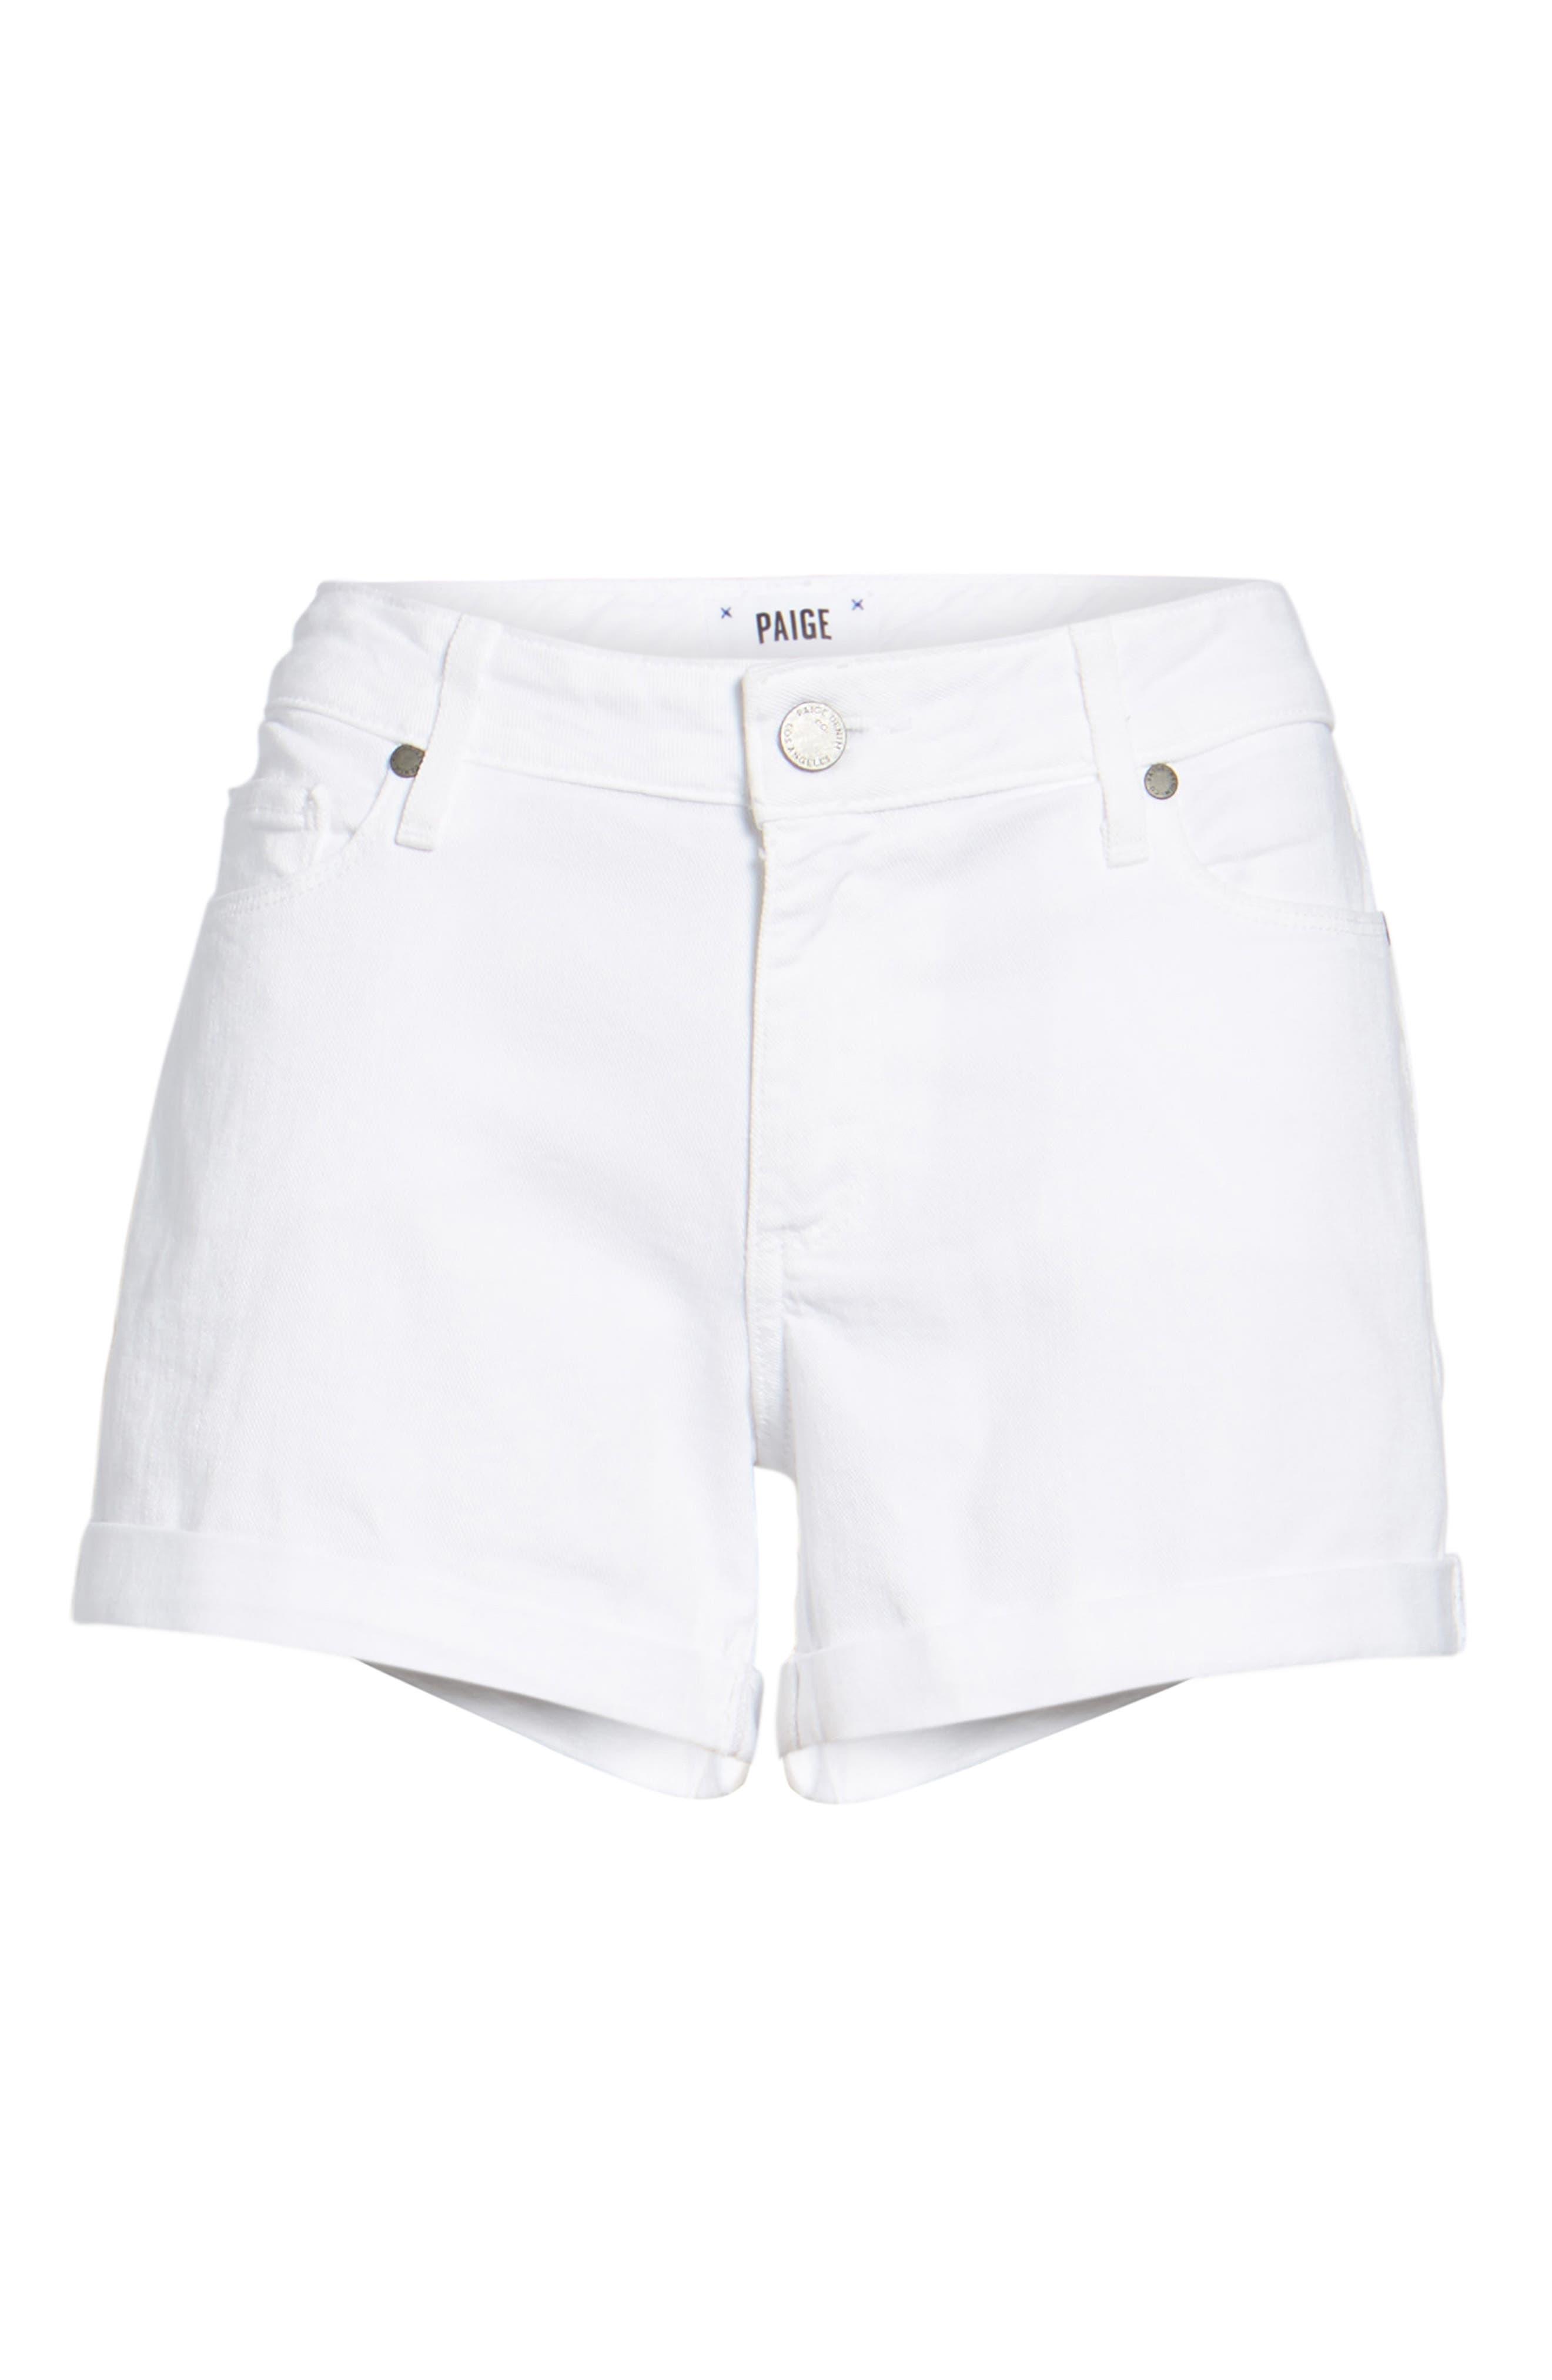 Paige 1226274-OWT /'Jimmy Jimmy Boyfriend Short/' in Optic White Size 29